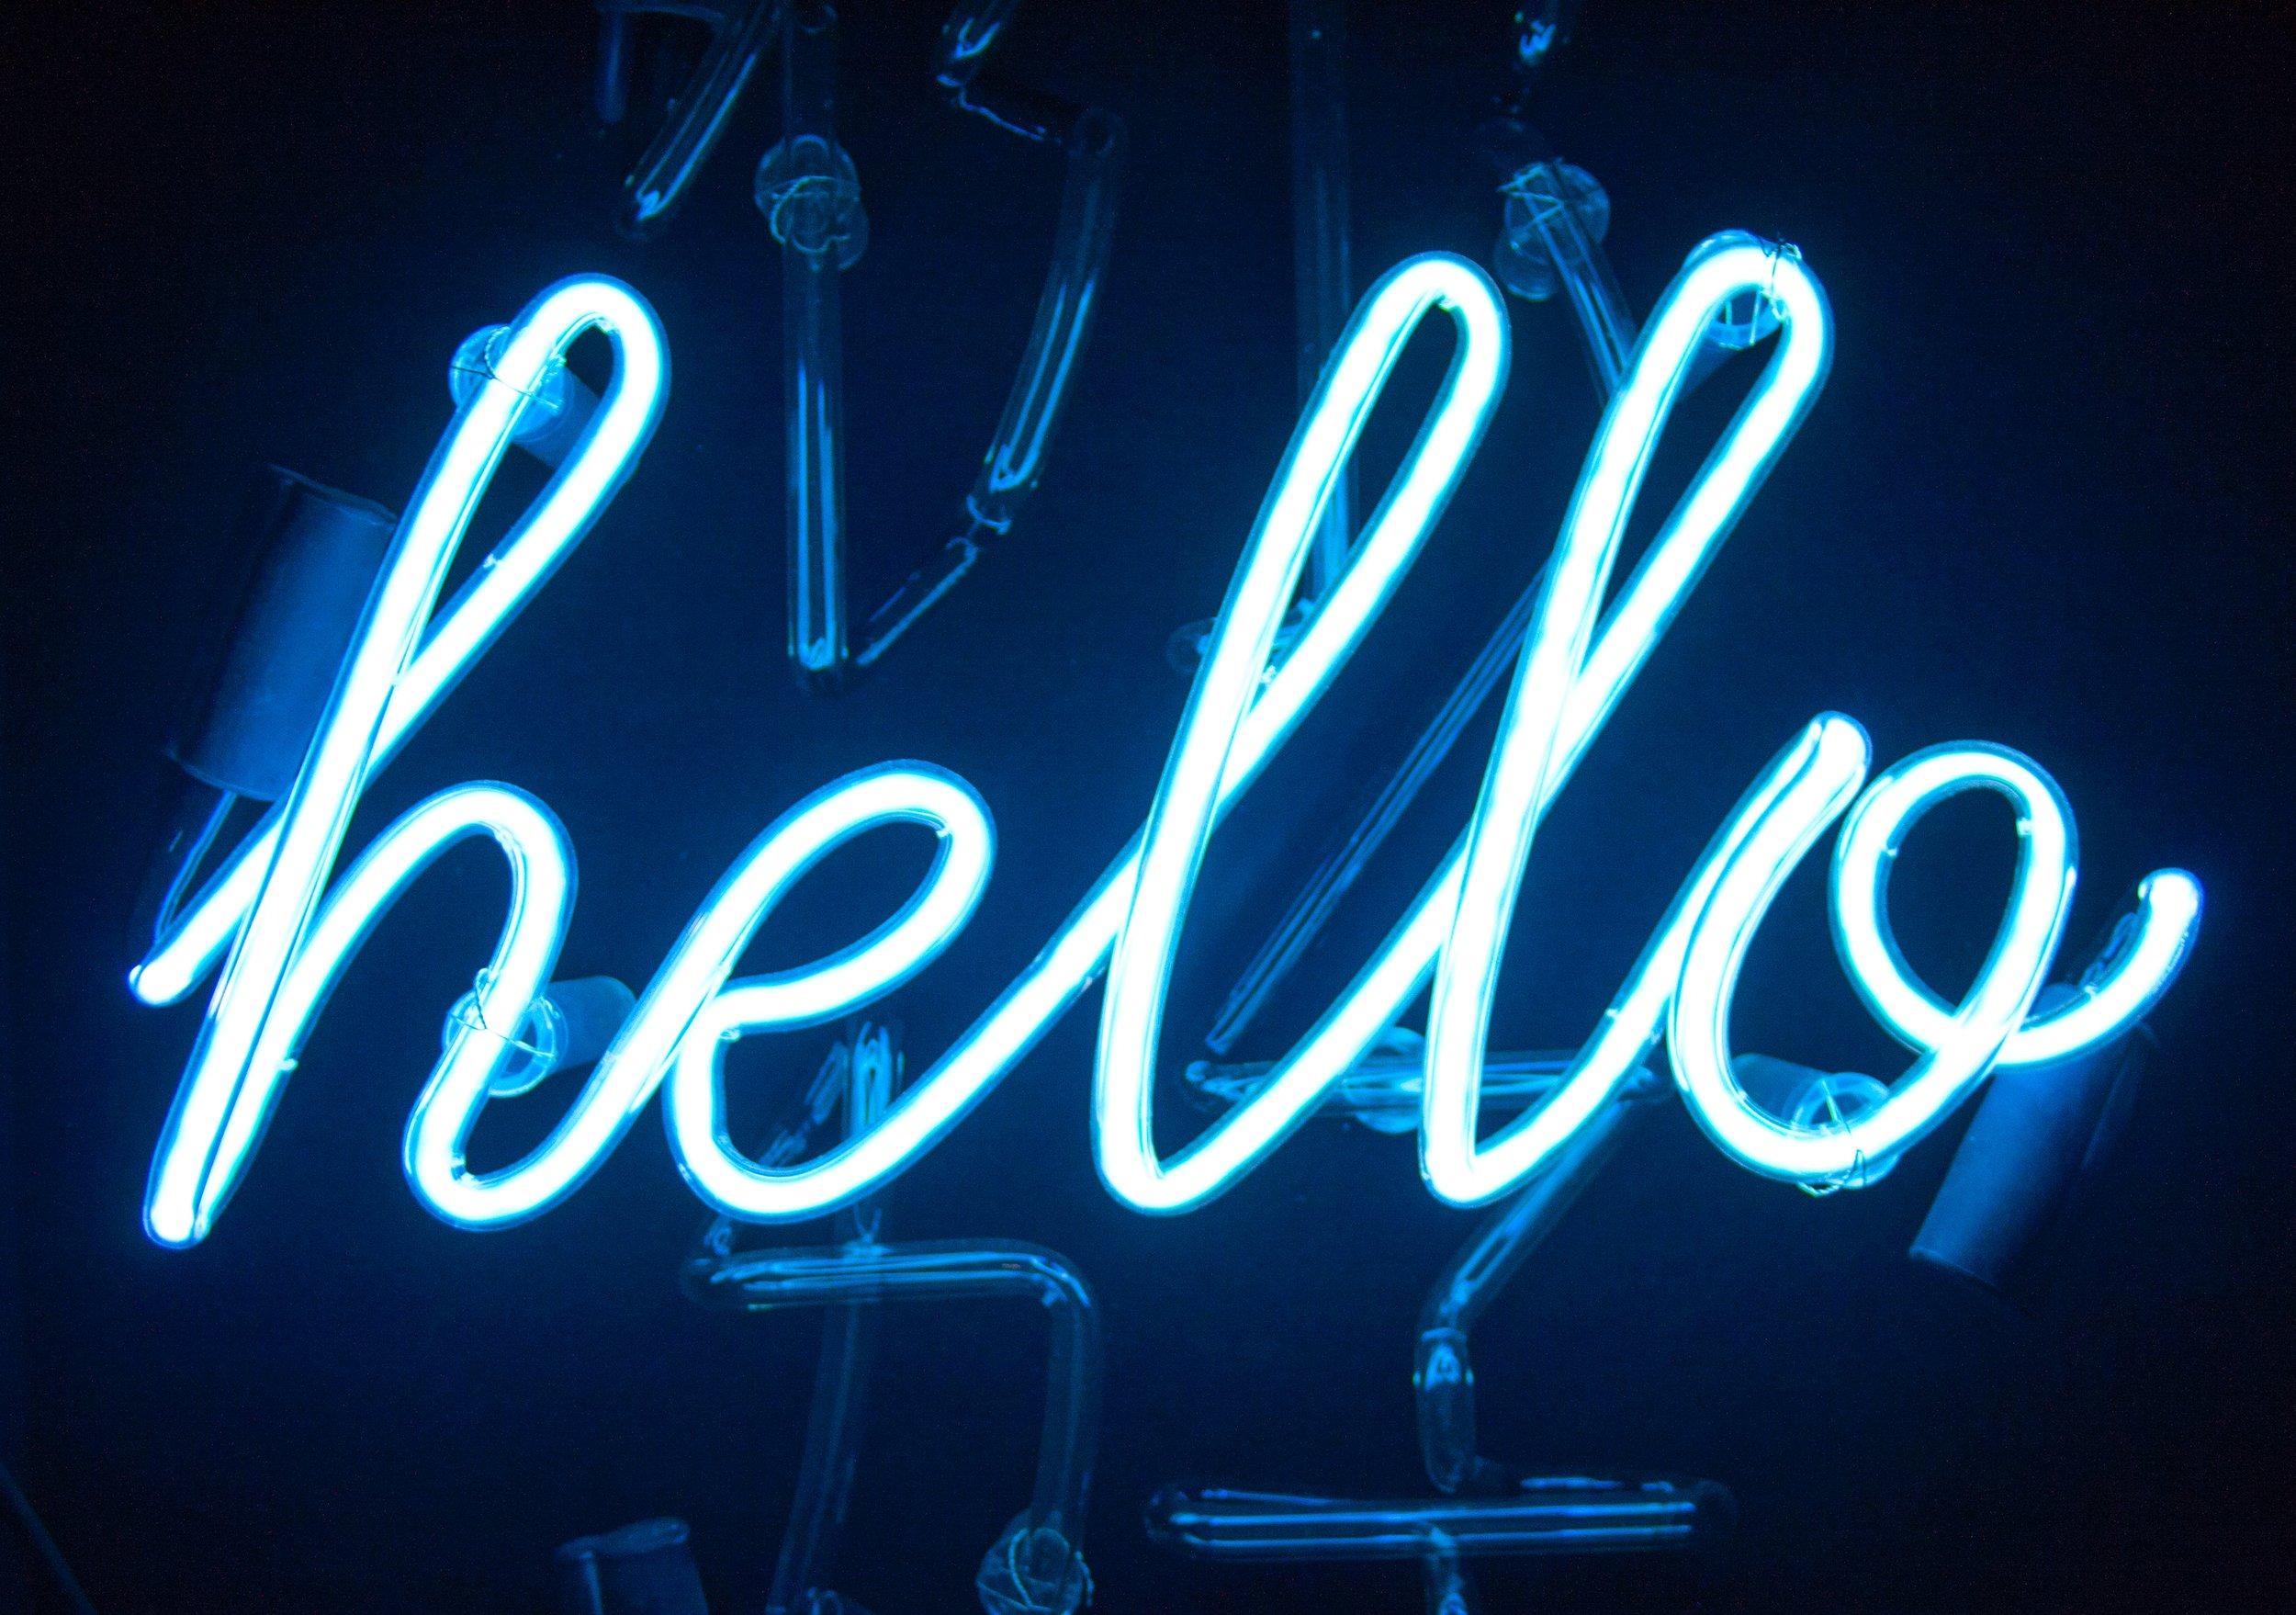 pablo-gentile-hello-587380-unsplash.jpg